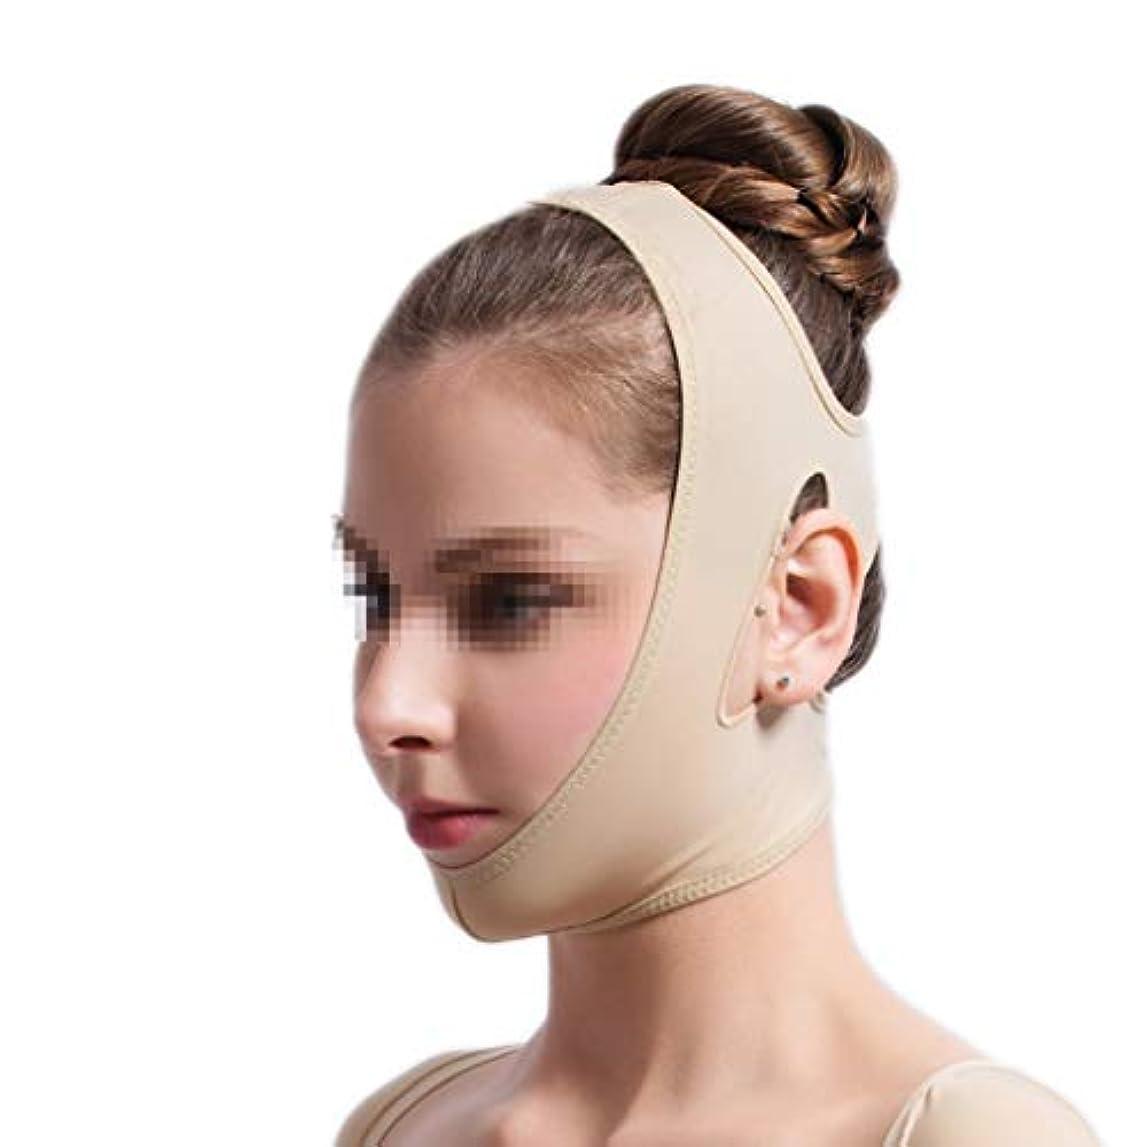 XHLMRMJ フェイスリフトマスク、下顎袖医療グレード脂肪吸引術整形弾性ヘッドギアダブルあご顔ライン彫刻圧力包帯 (Size : XL)